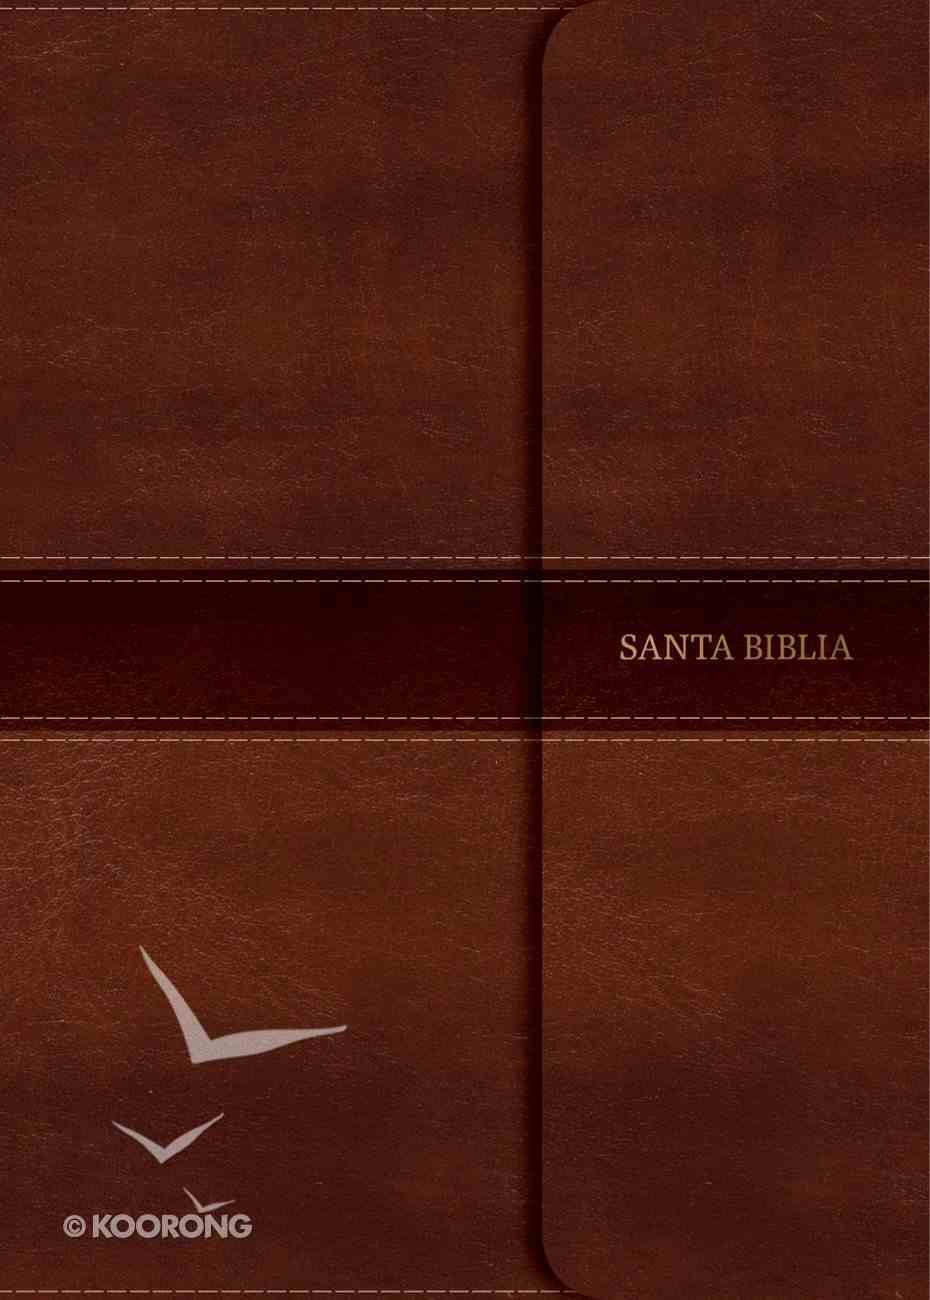 Nvi Biblia Letra Gigante Marron Solapa Con Iman (Giant Print Magnetic Flap) Imitation Leather